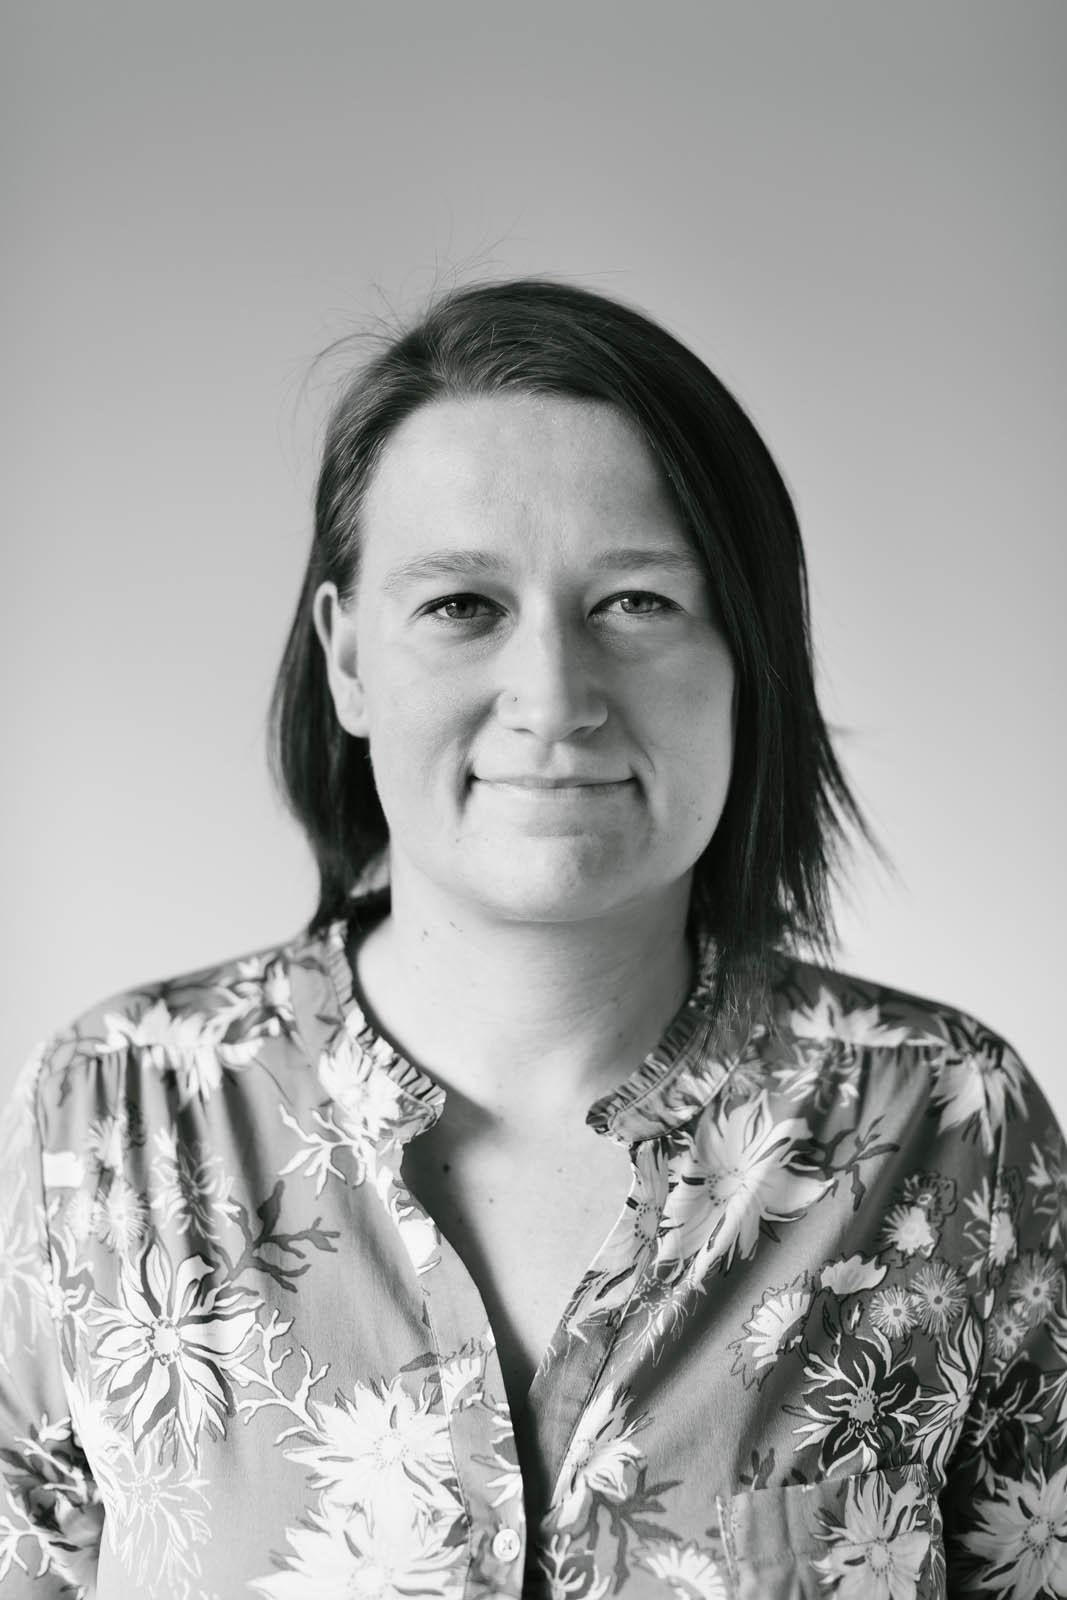 Filotax 021-Samantha Callens-dossierbeheerder